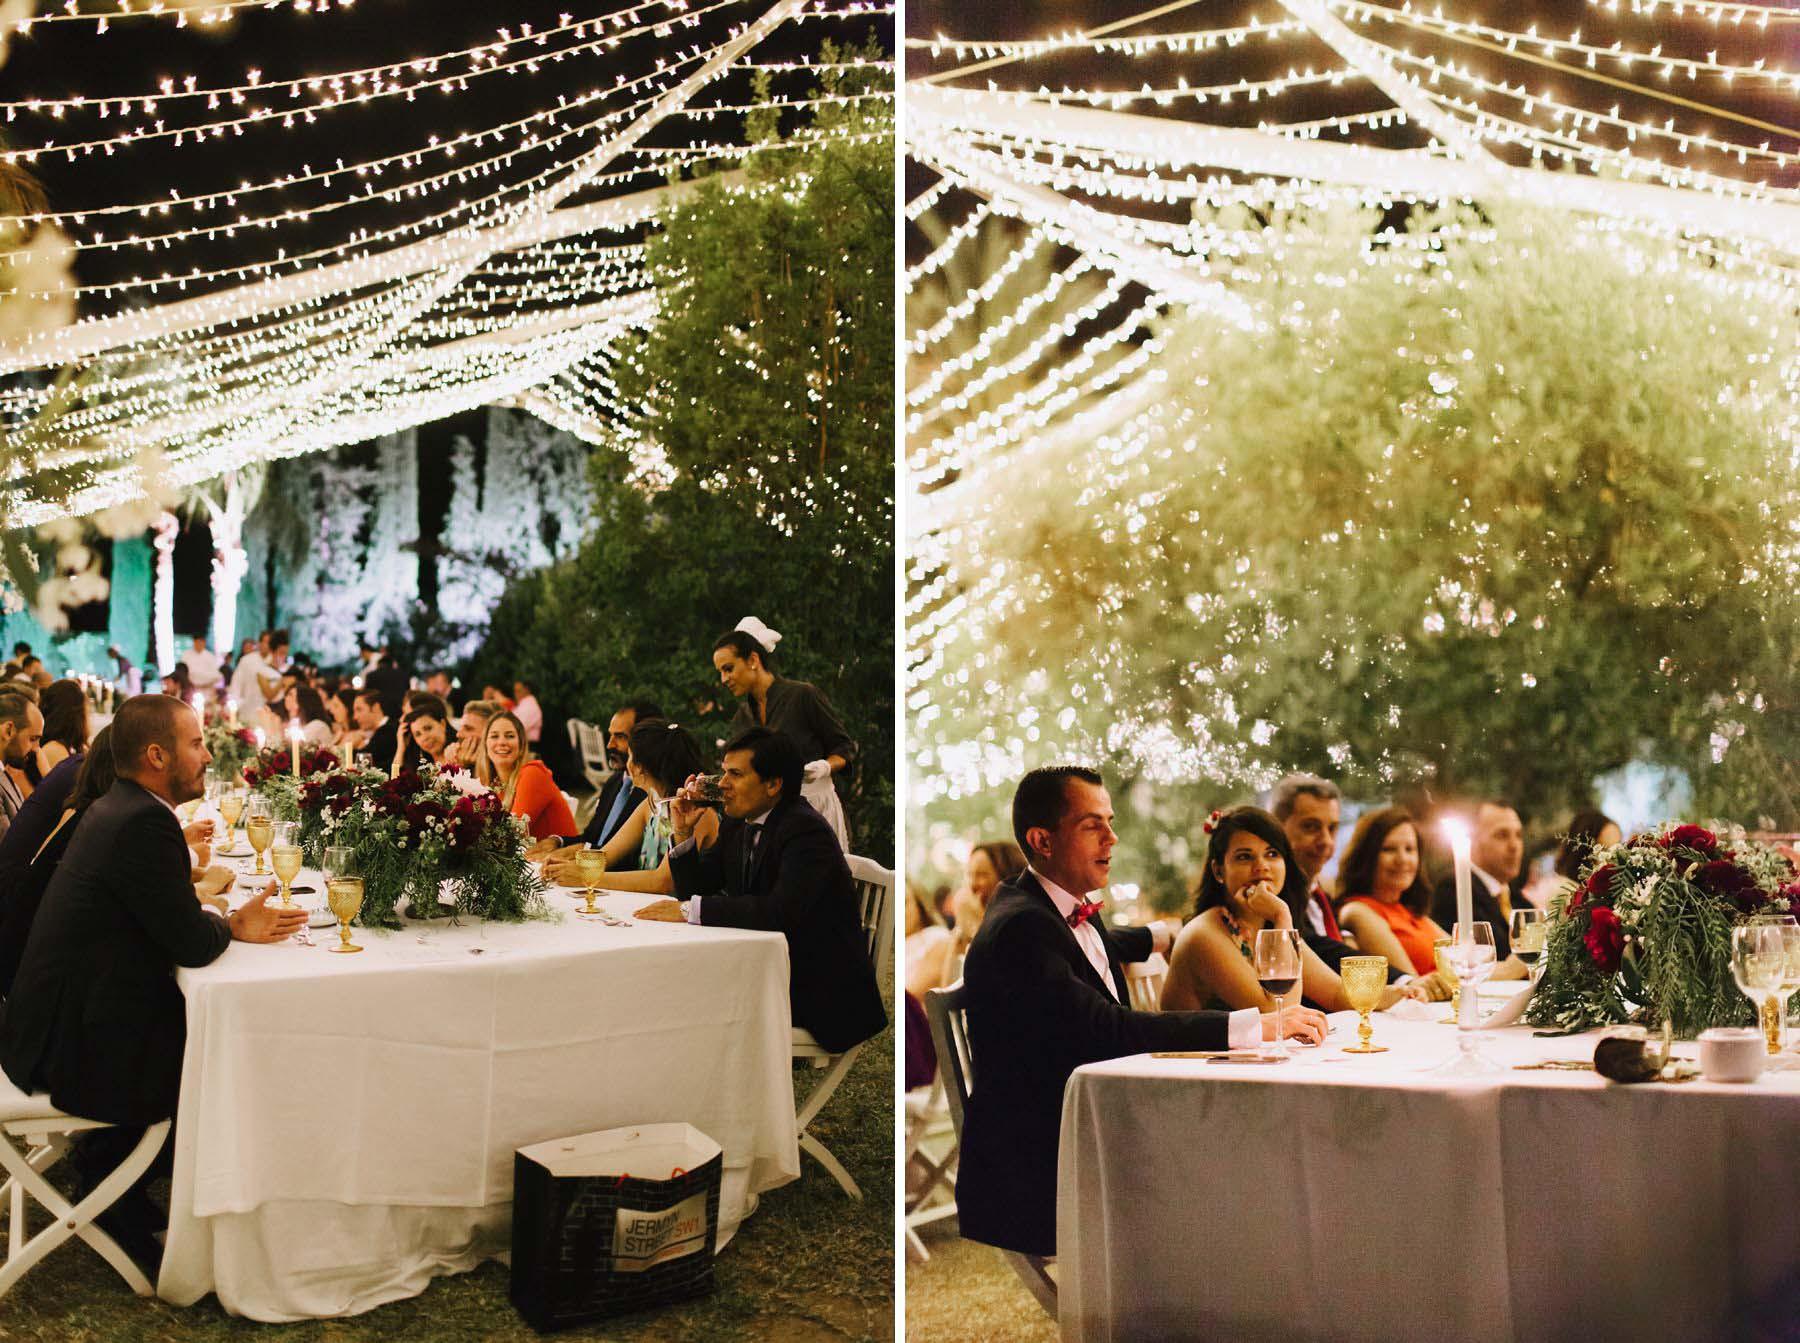 fotografo de bodas Jairo Crena-242